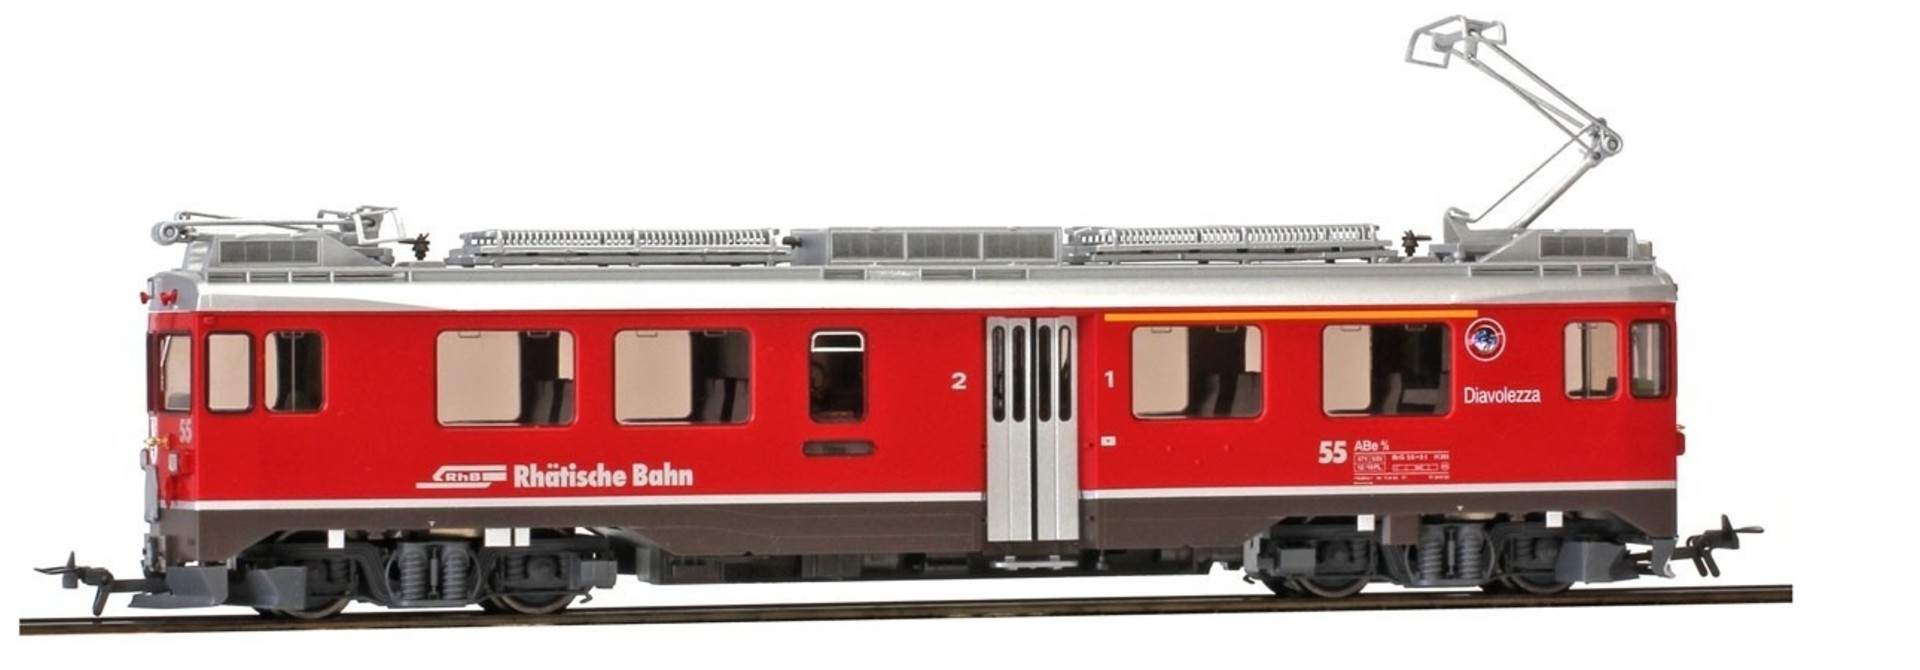 "1269107 RhB ABe 4/4 55 Berninatriebwagen ""Diavolezza"""